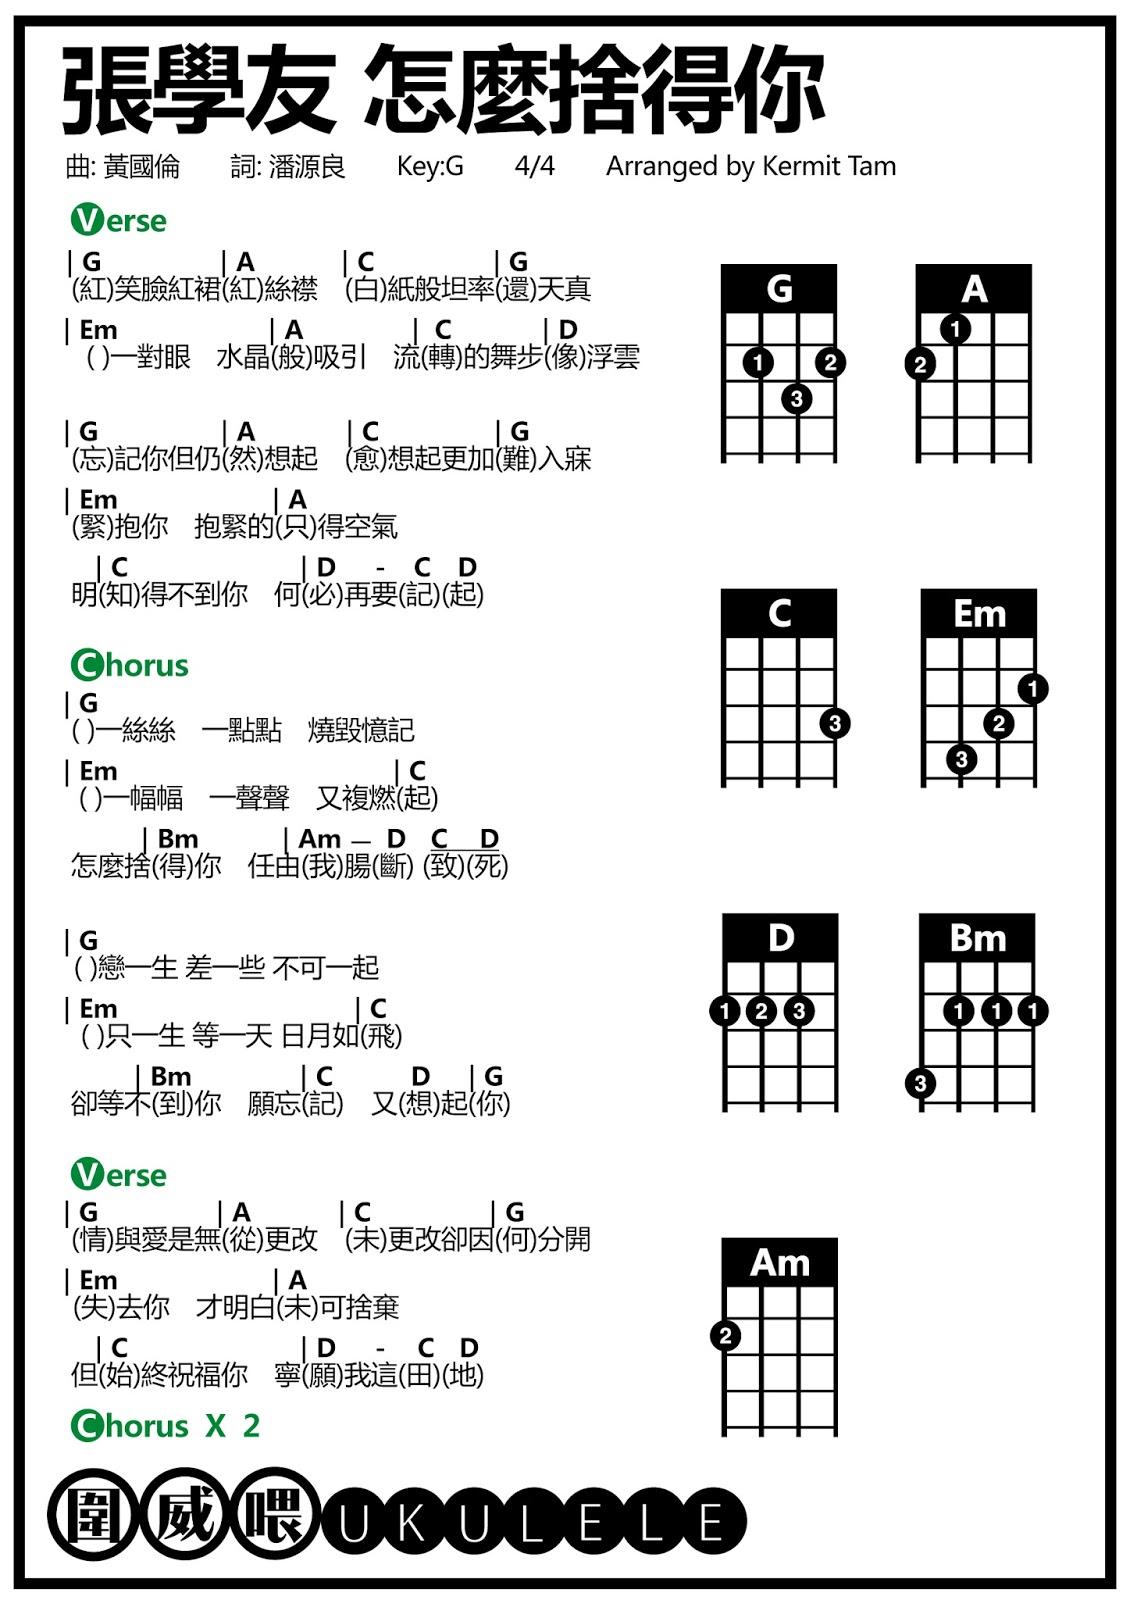 圍威喂 ukulele: 張學友 怎麼捨得你 [ukulele譜]